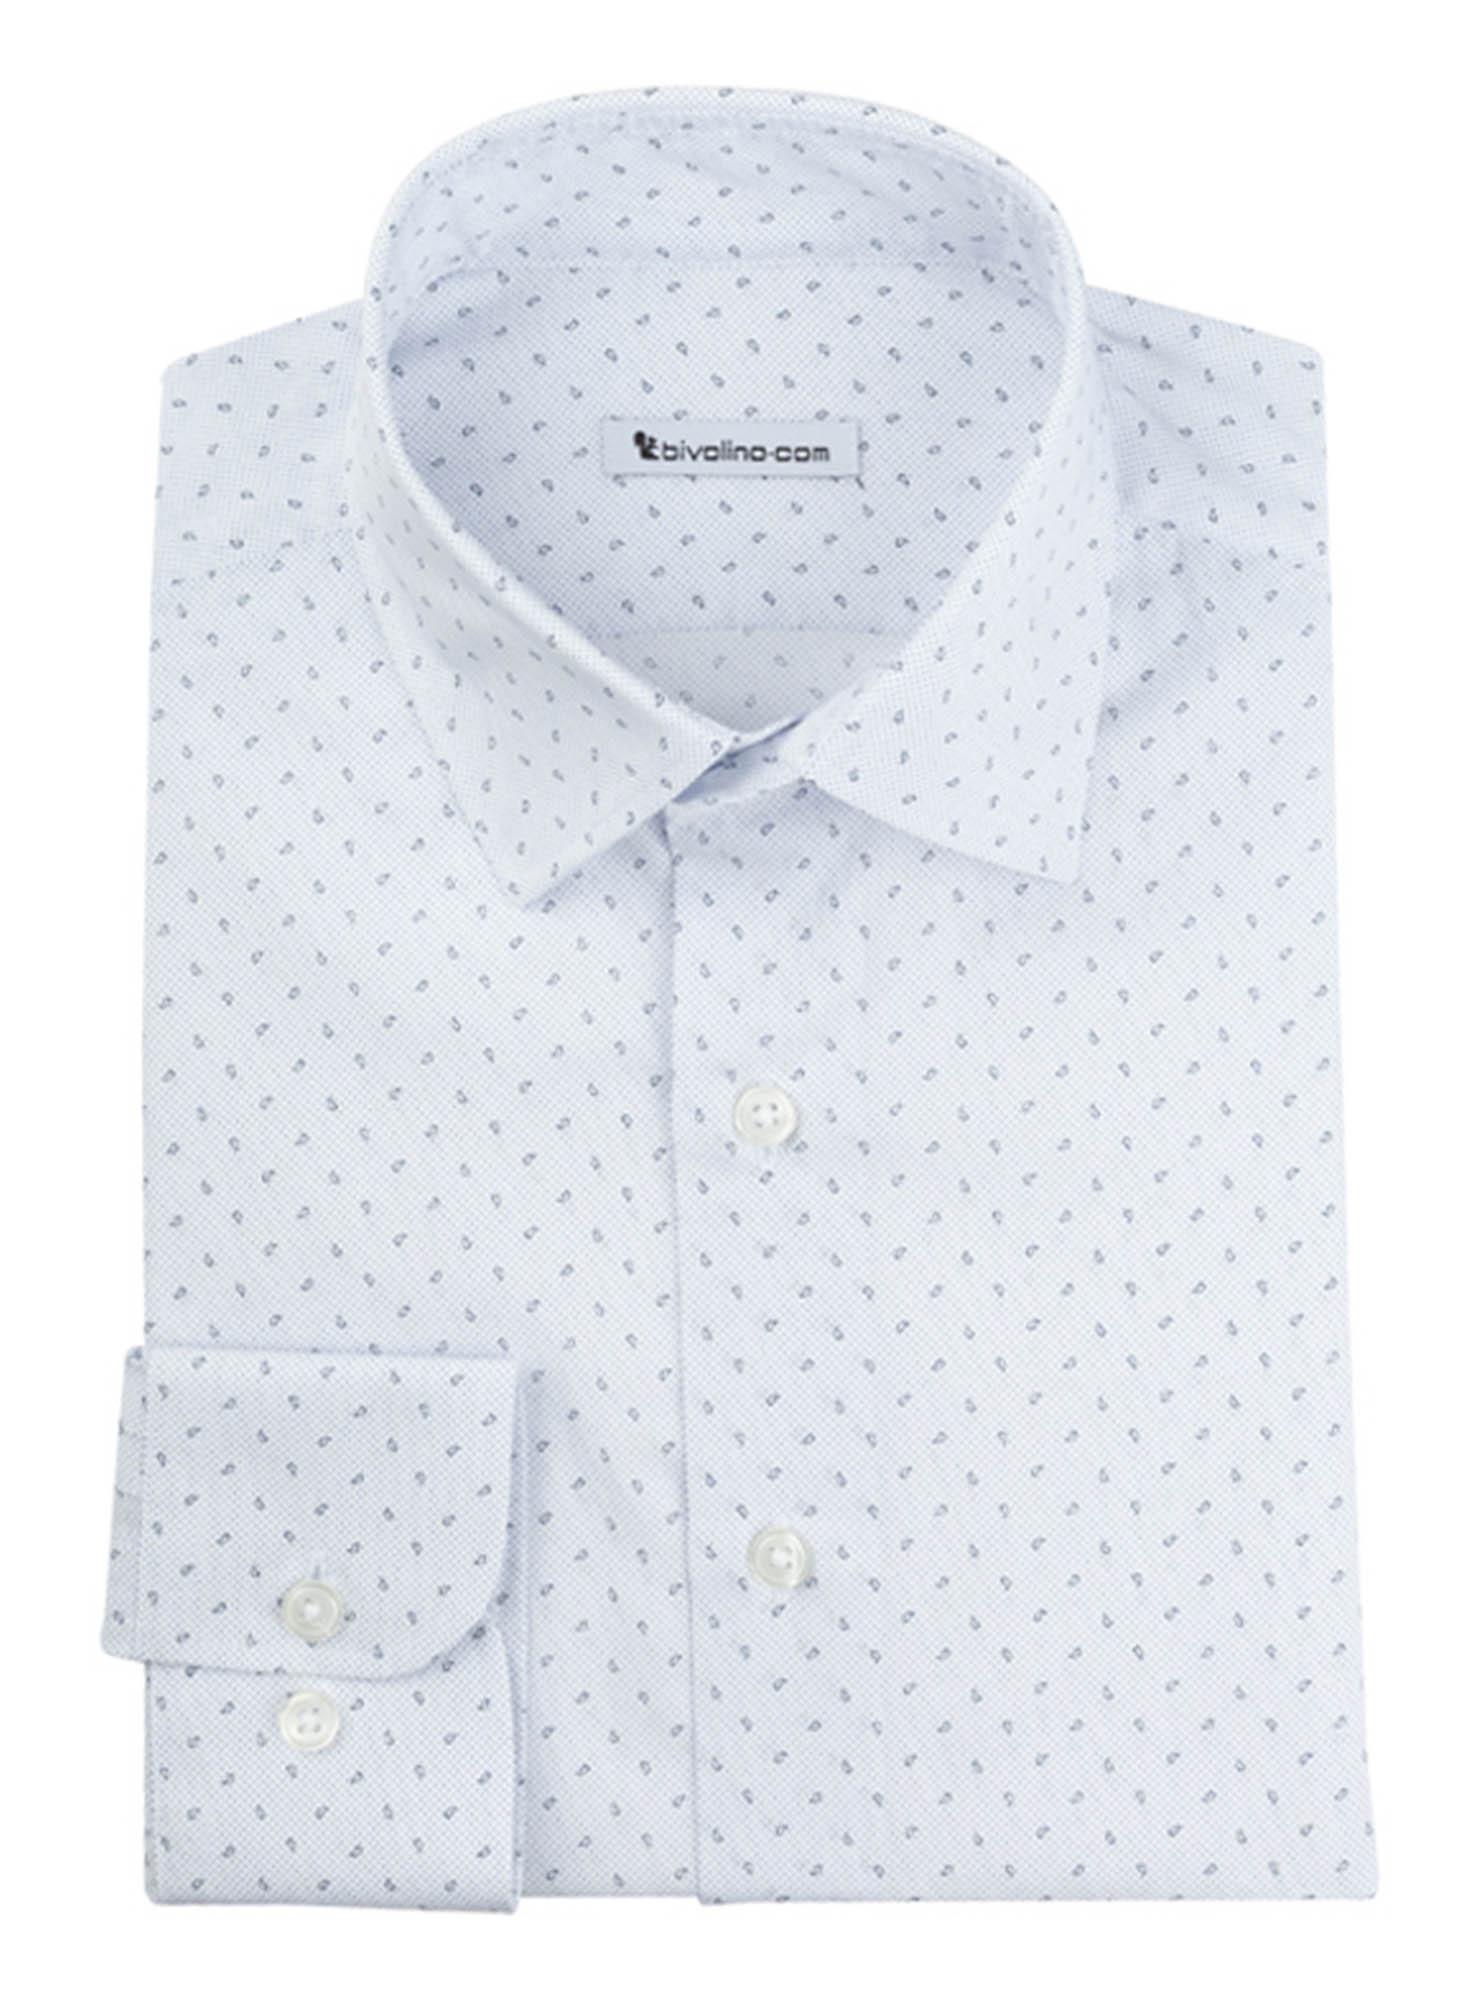 ARTENA - chemise homme coton Micro-Print Cachemire - MICRO 9